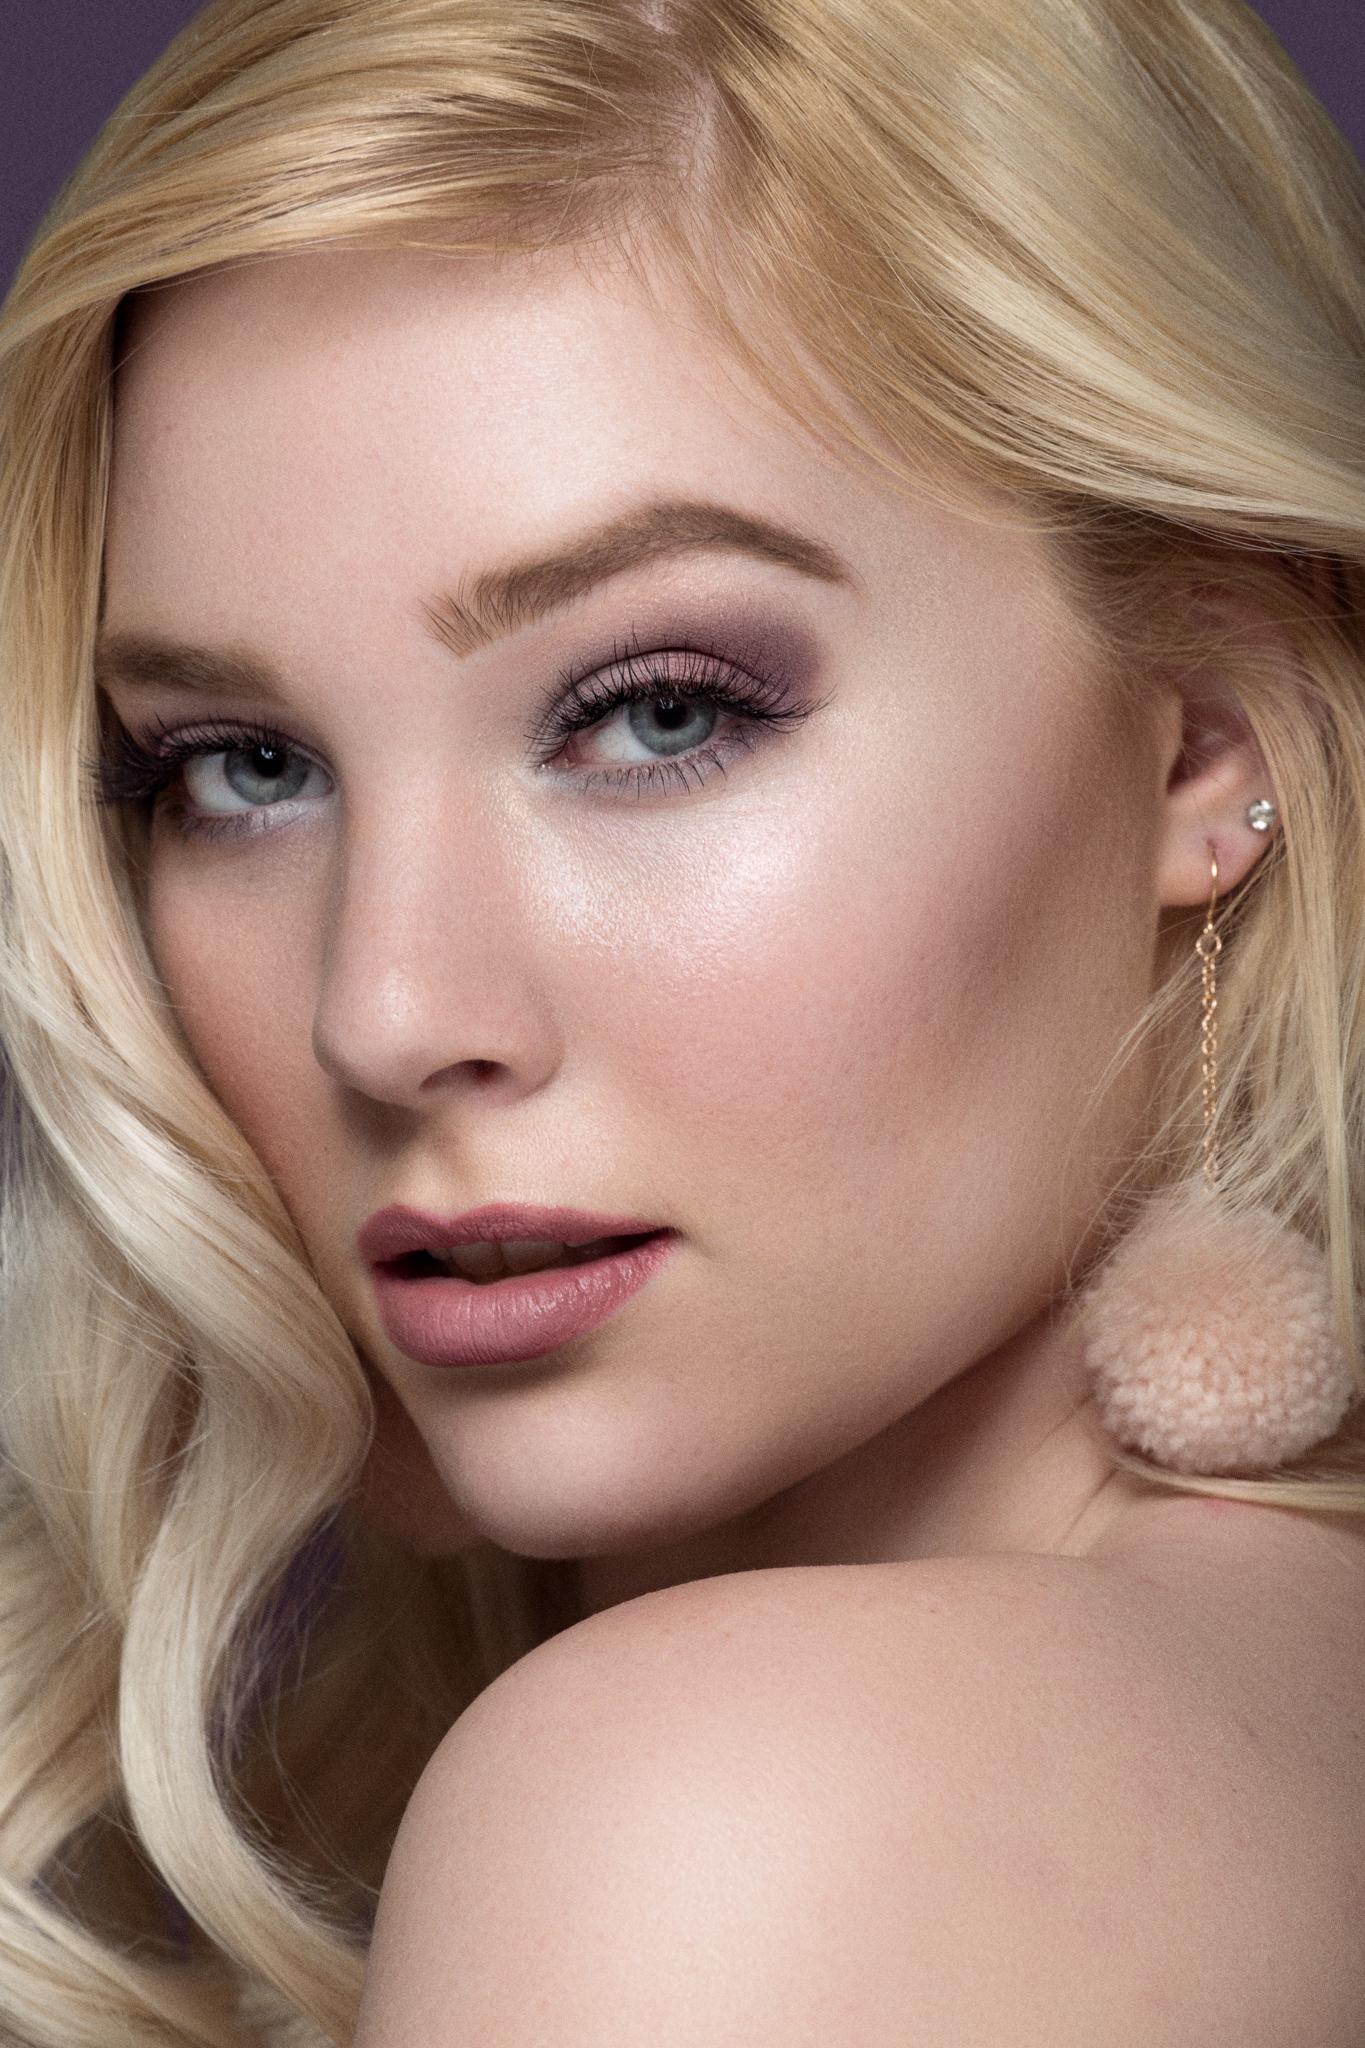 170125_Los Angeles Beauty & Product Photographer_2017-01-25 Katie Phillips_IMG_0027-Edit.jpg